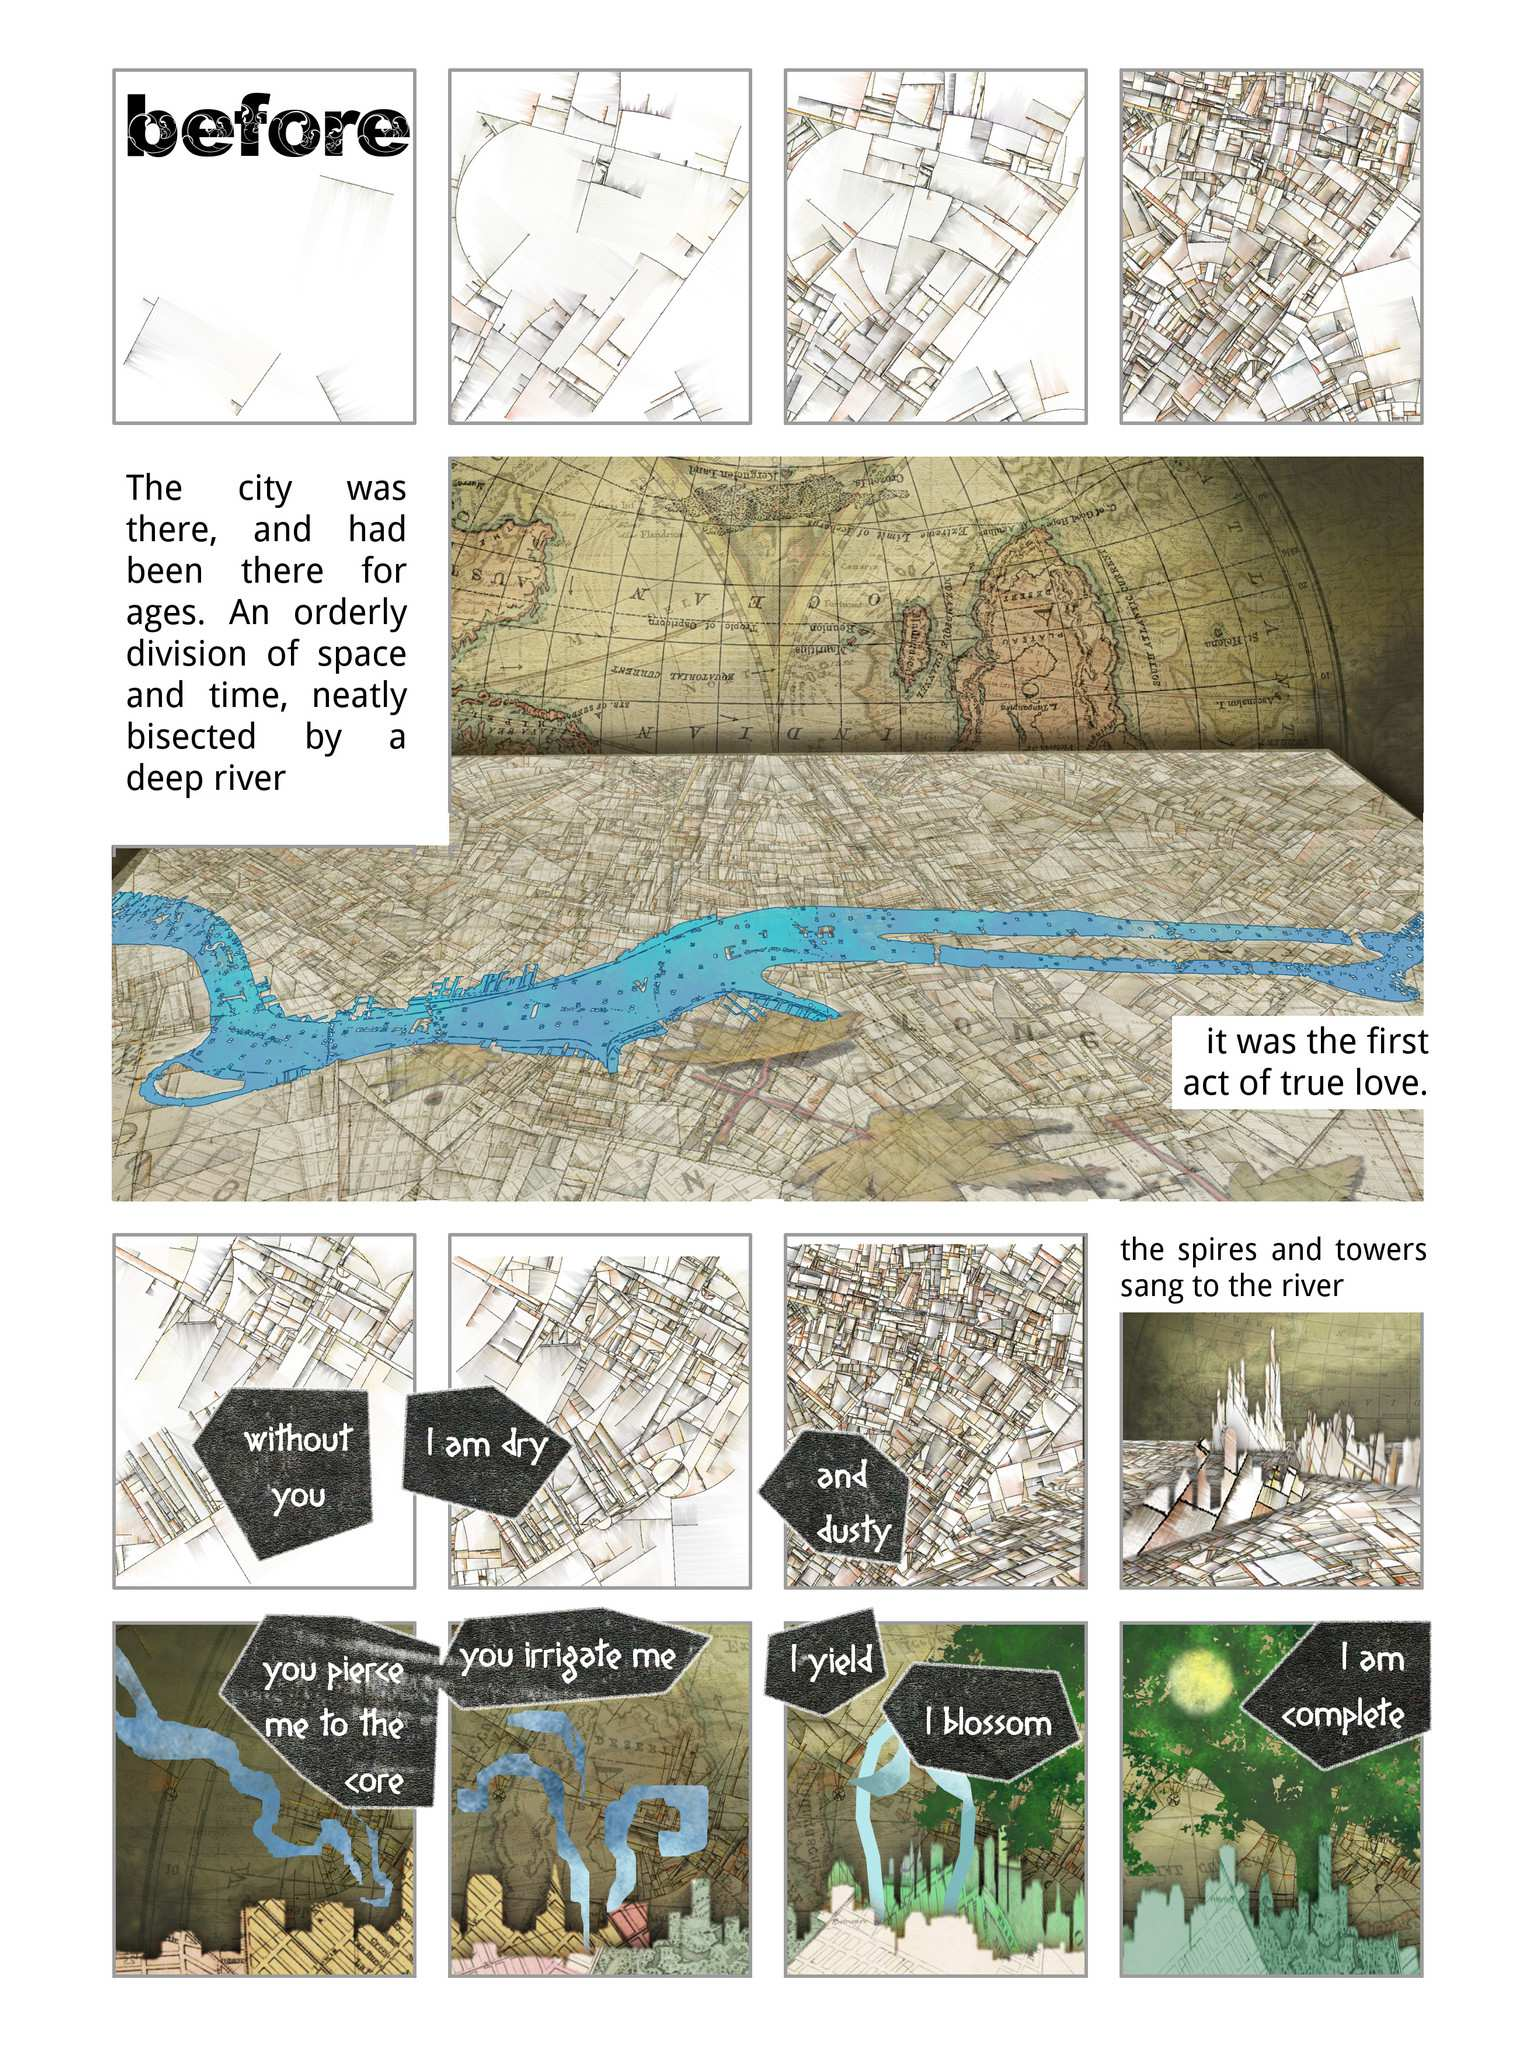 Panelalia 01 -  Urban Landscapes by Dave Crane